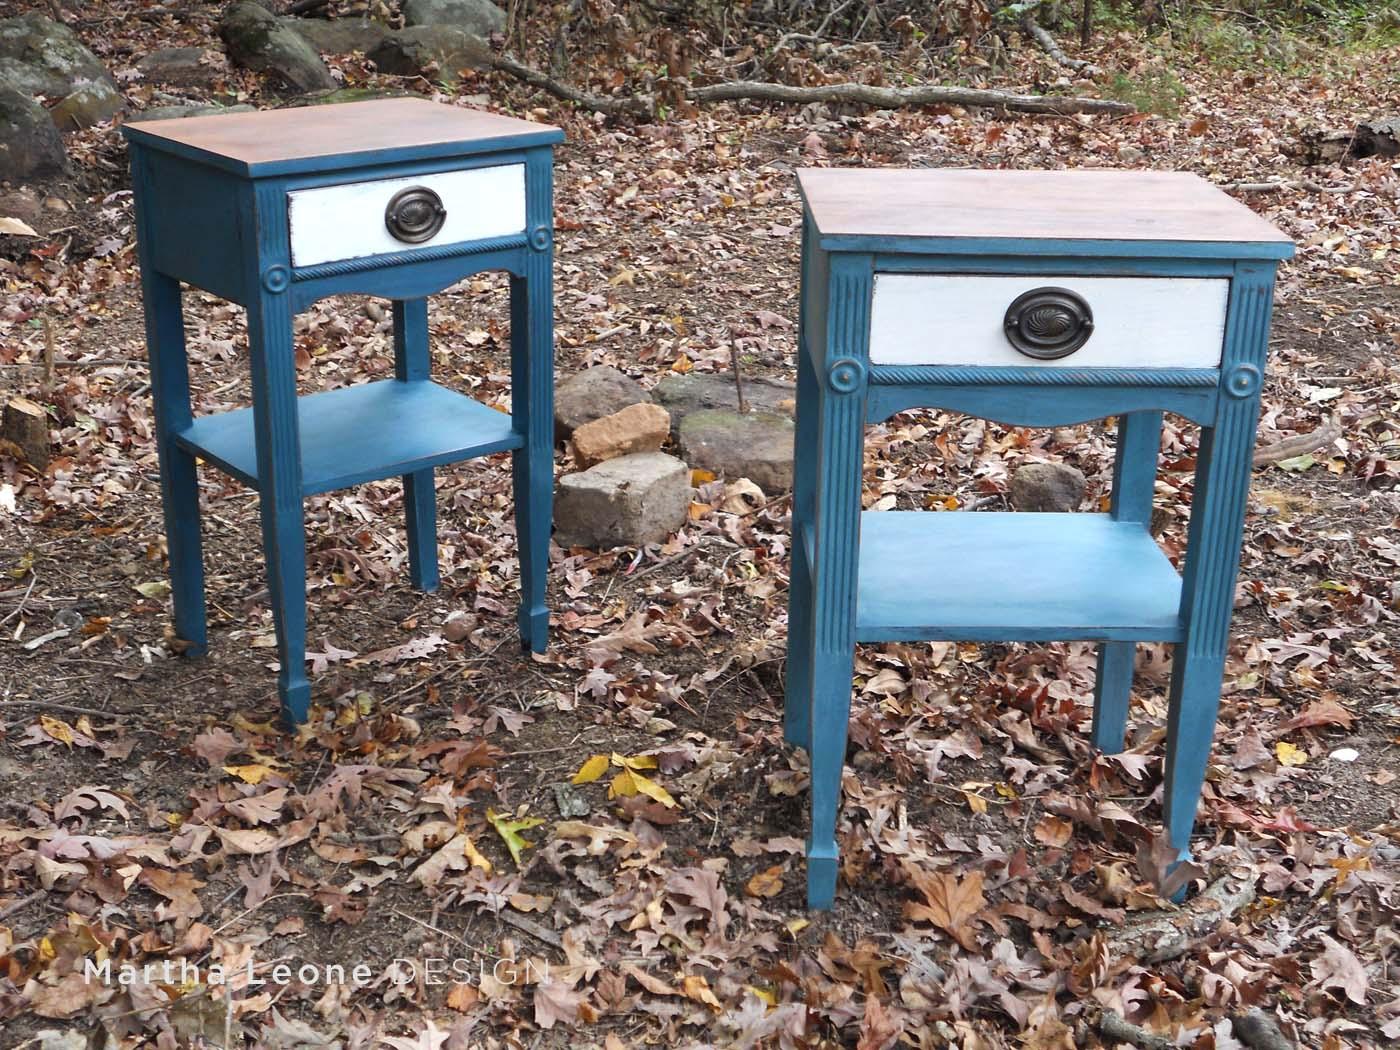 Blue with hepplewhite 3 at MarthaLeoneDesign